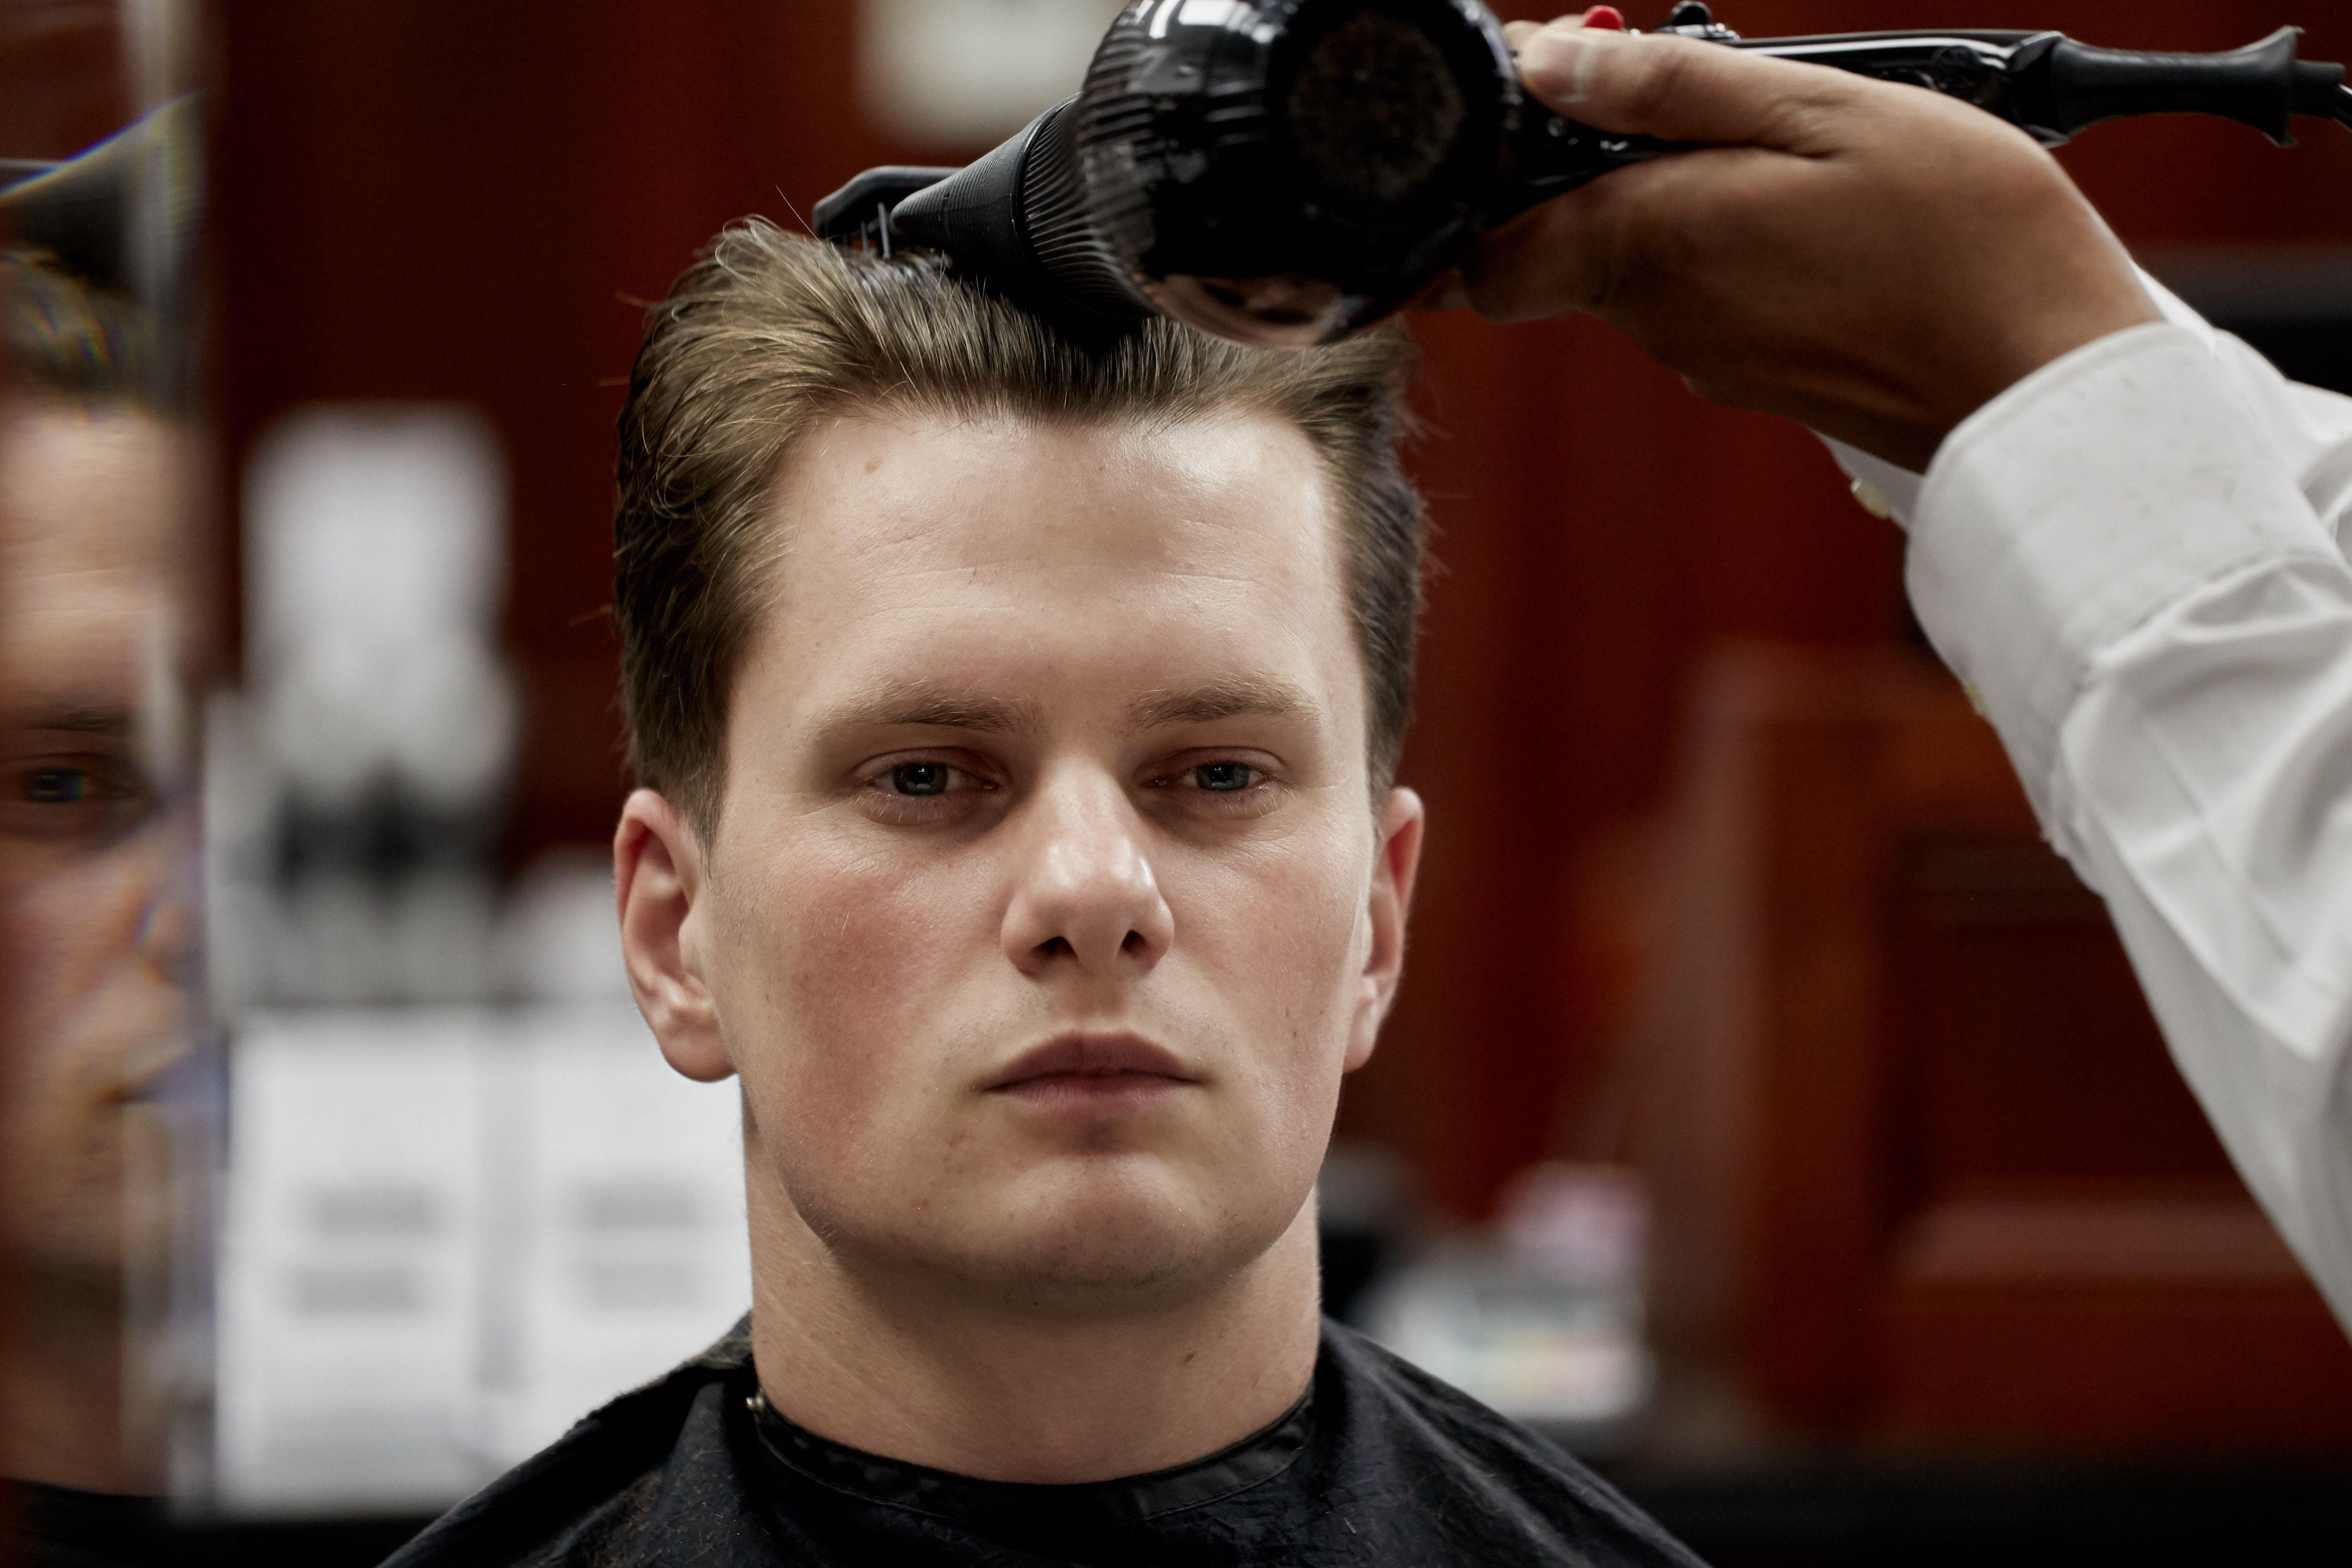 Barber Shop Nyc Best Barbers Near Me Haircut Near Me Beard Trim